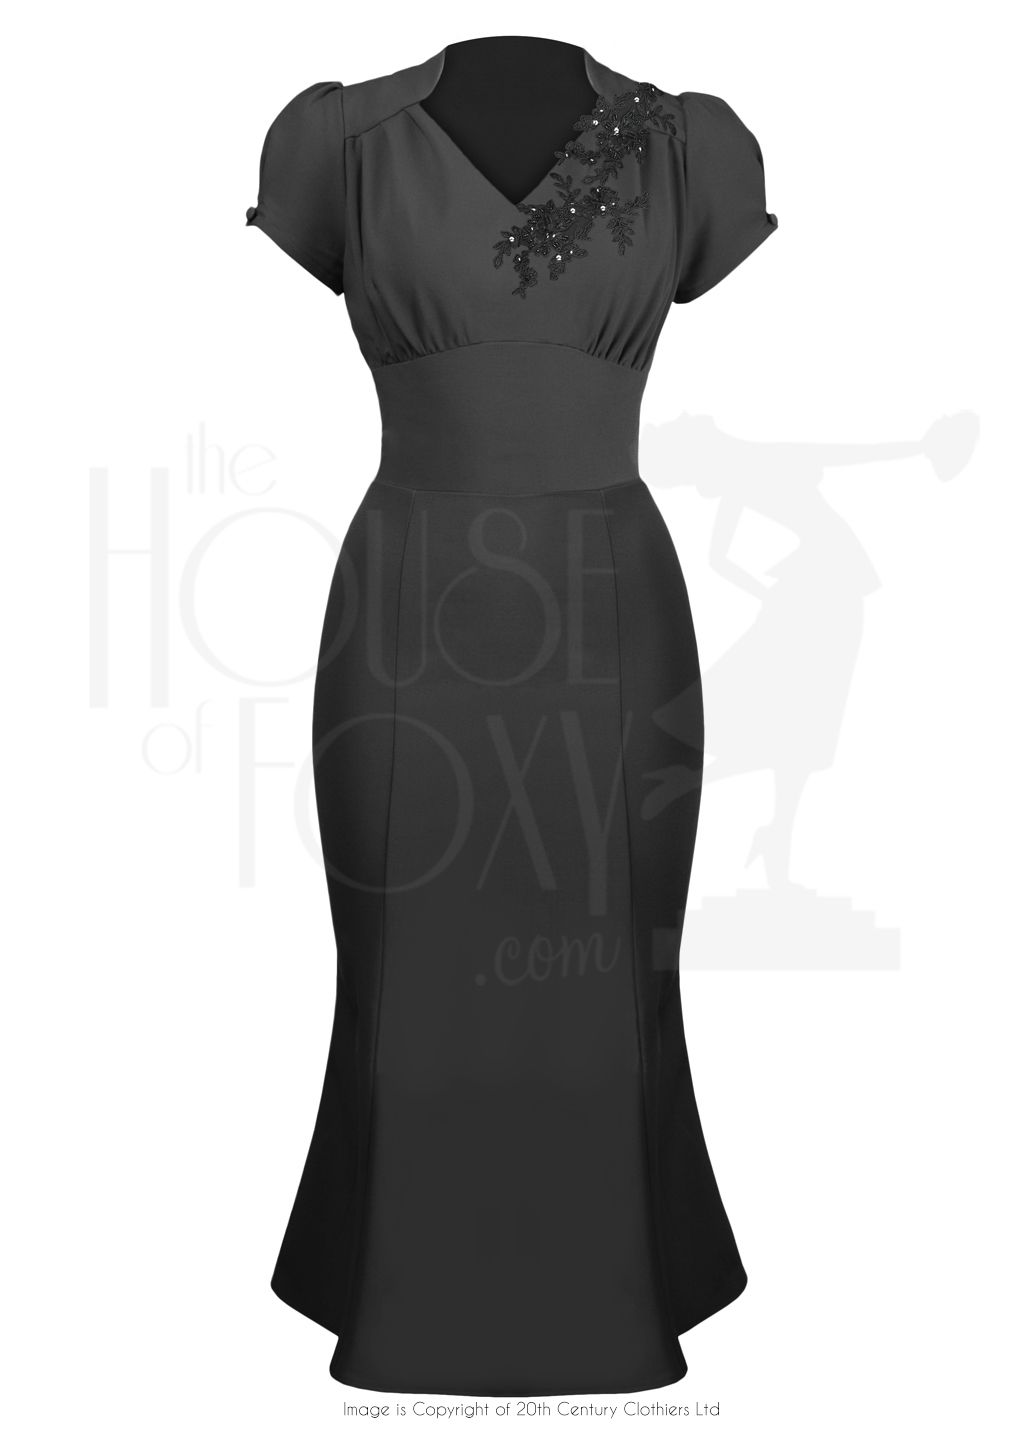 1940s Victory Evening Dress In Black Applique Evening Dresses Vintage 1940s Fashion Dresses Retro Fashion Outfits [ 1446 x 1024 Pixel ]